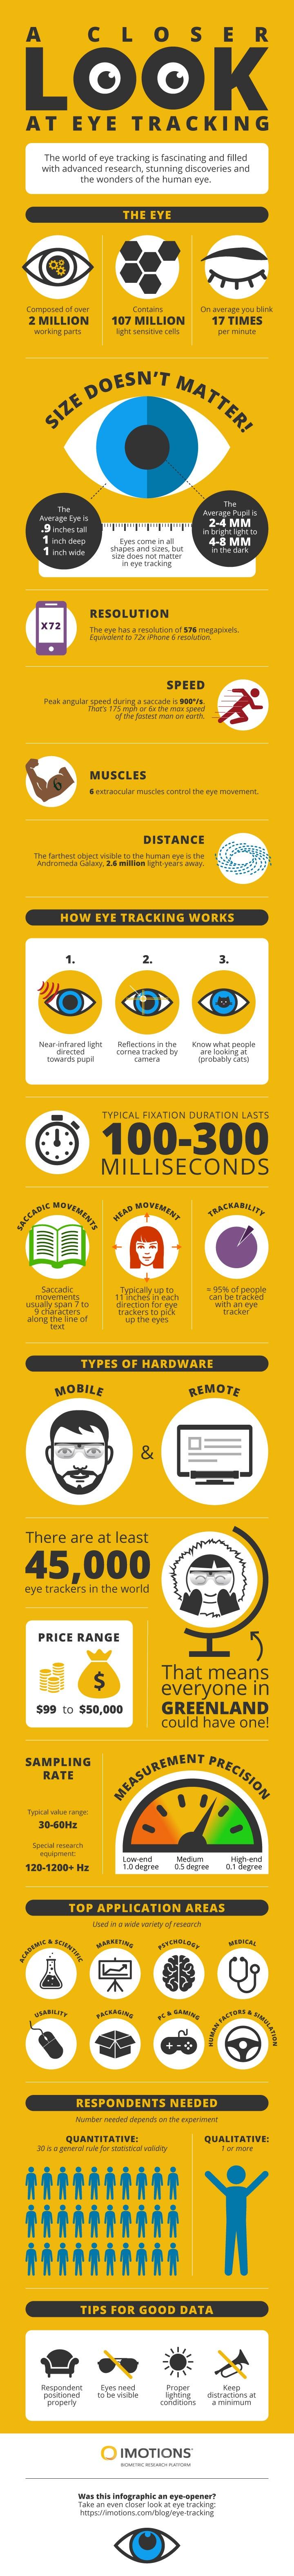 eye-tracking-infographic.jpg